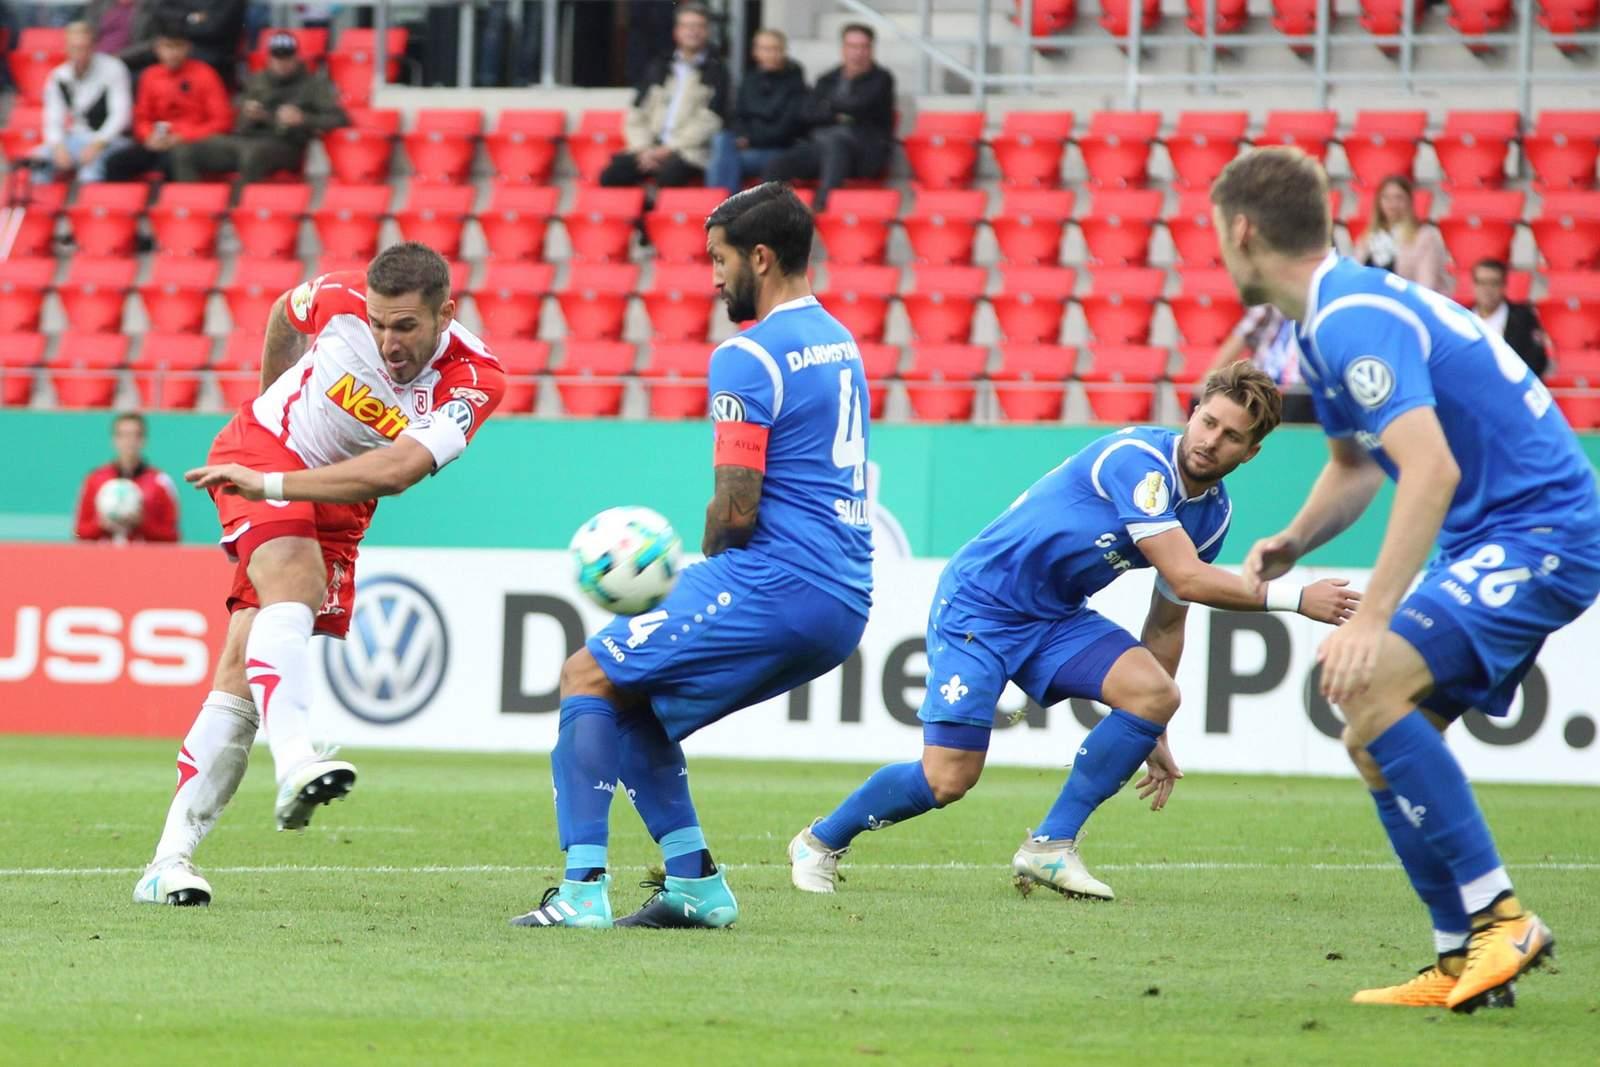 Marco Grüttner beim Torschuss gegen Darmstadt 98